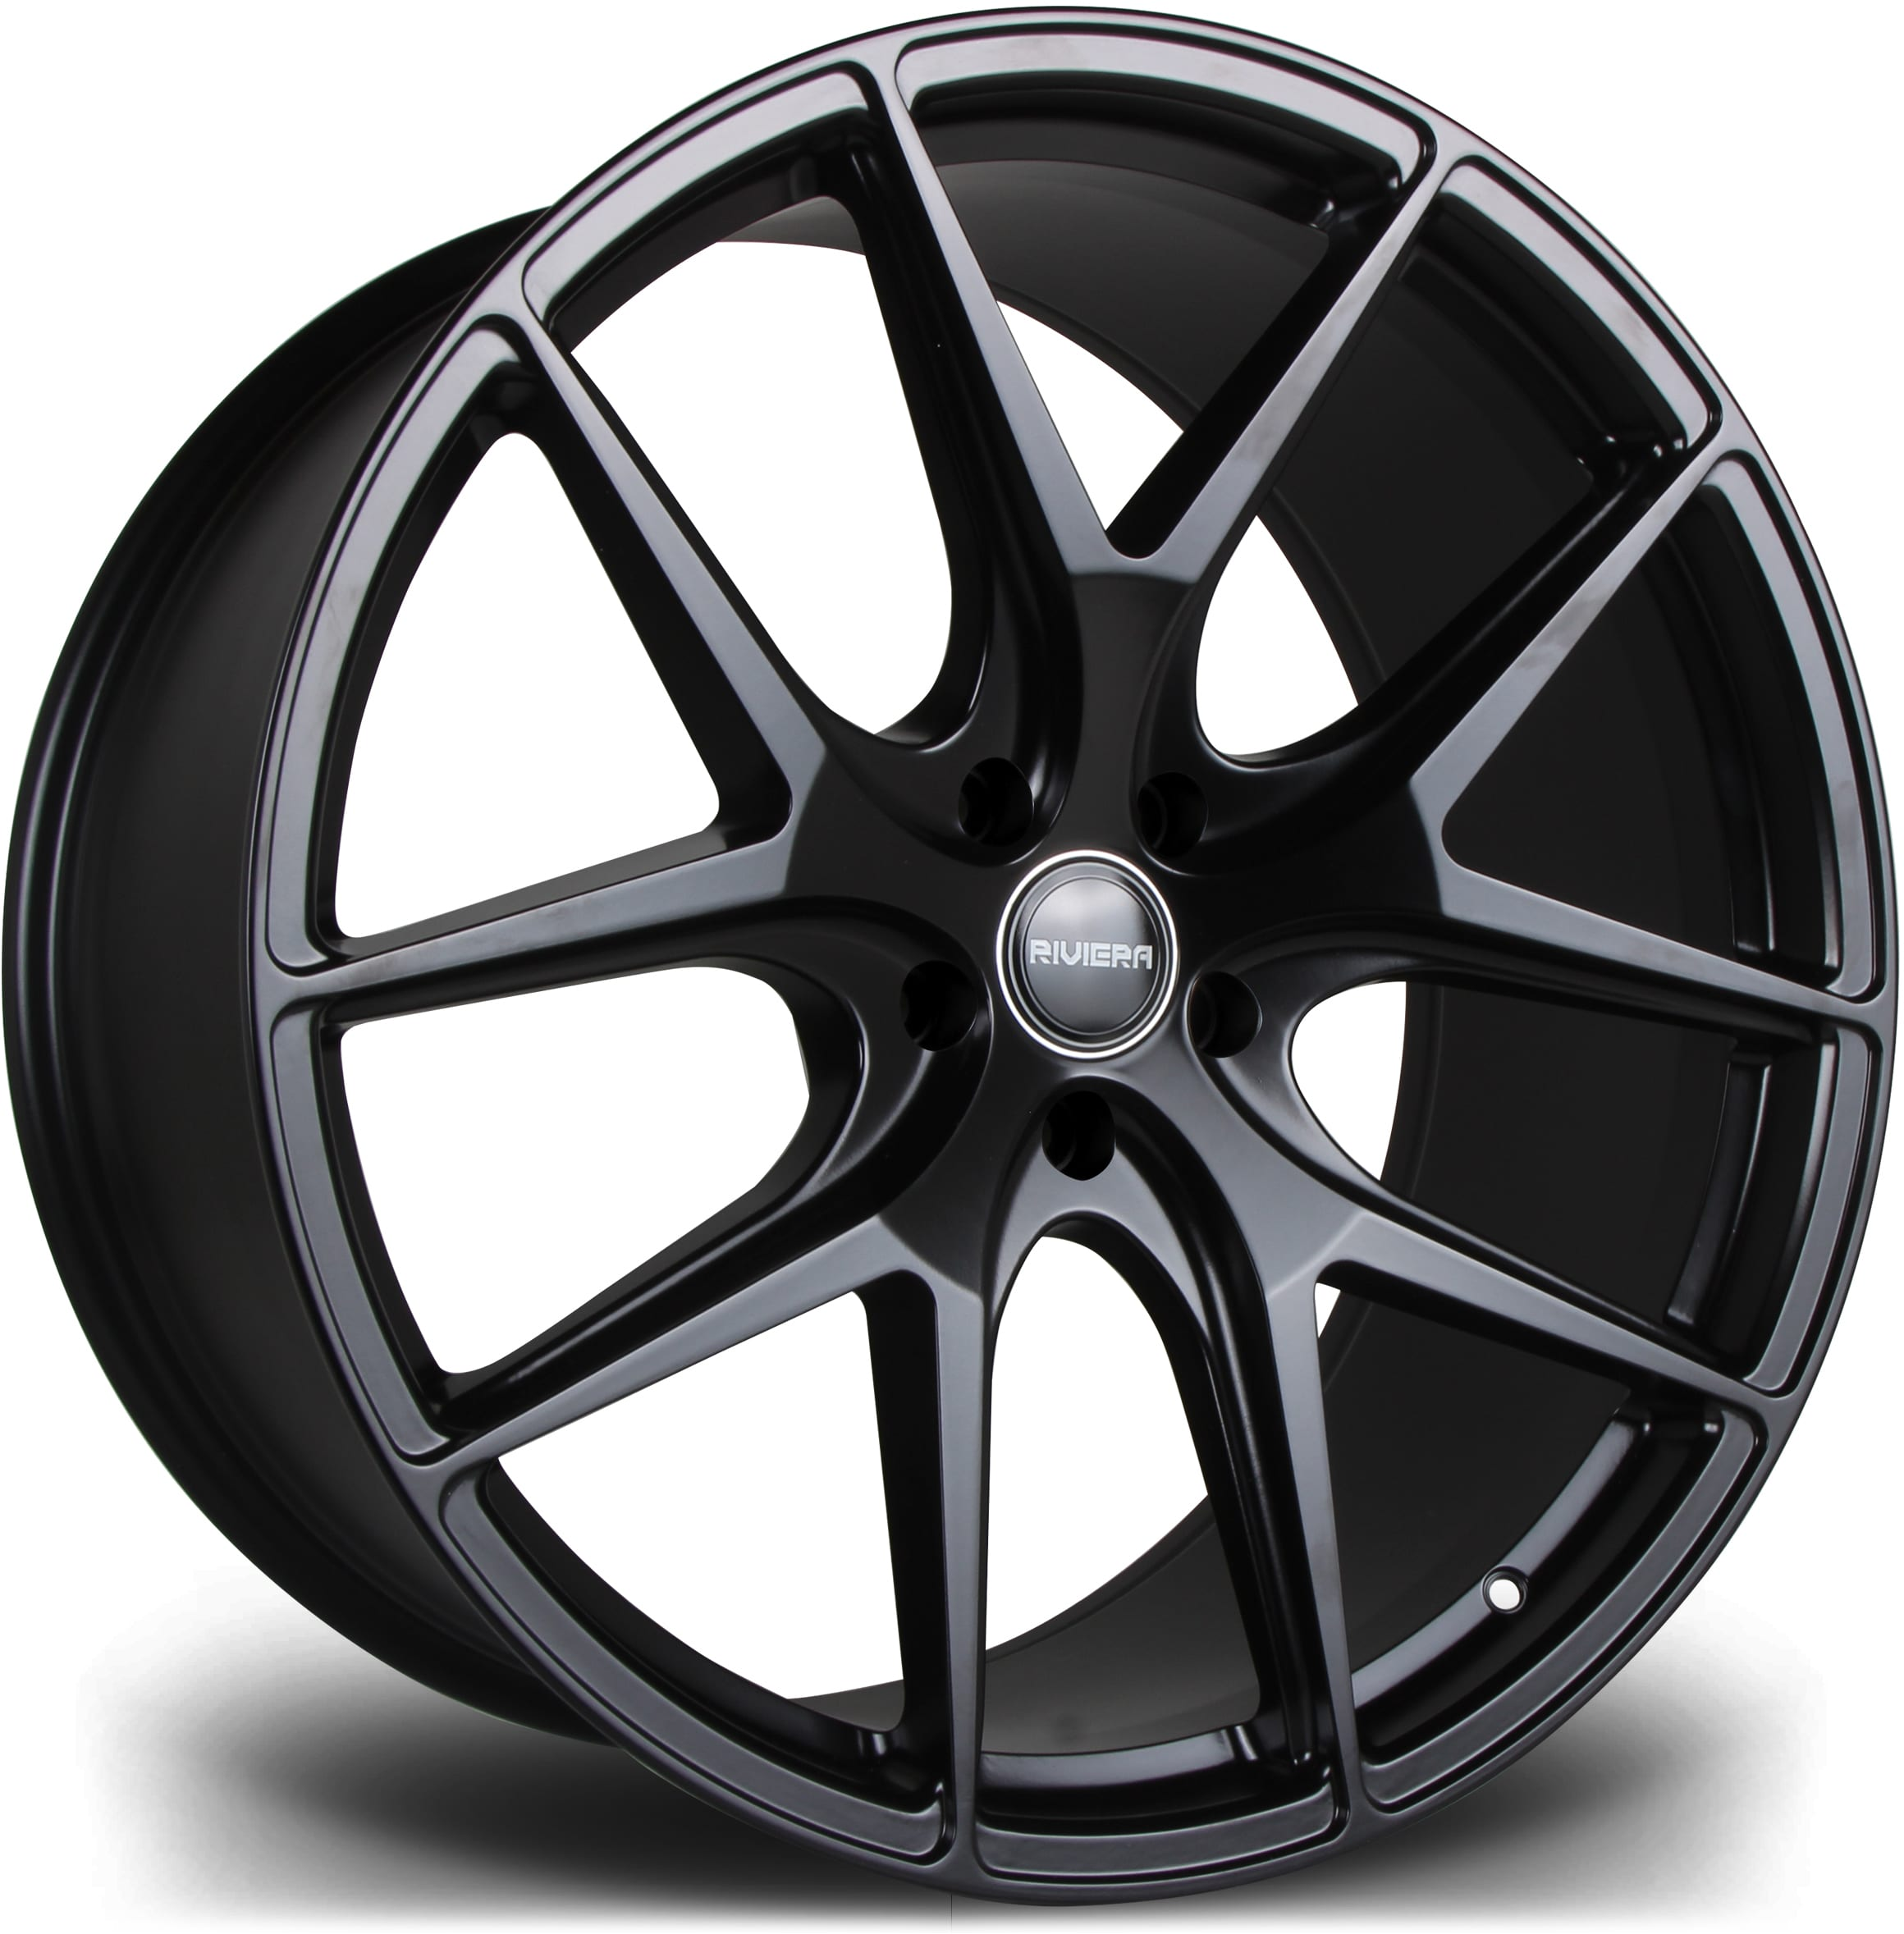 Riviera - RV136 (Satin Black)